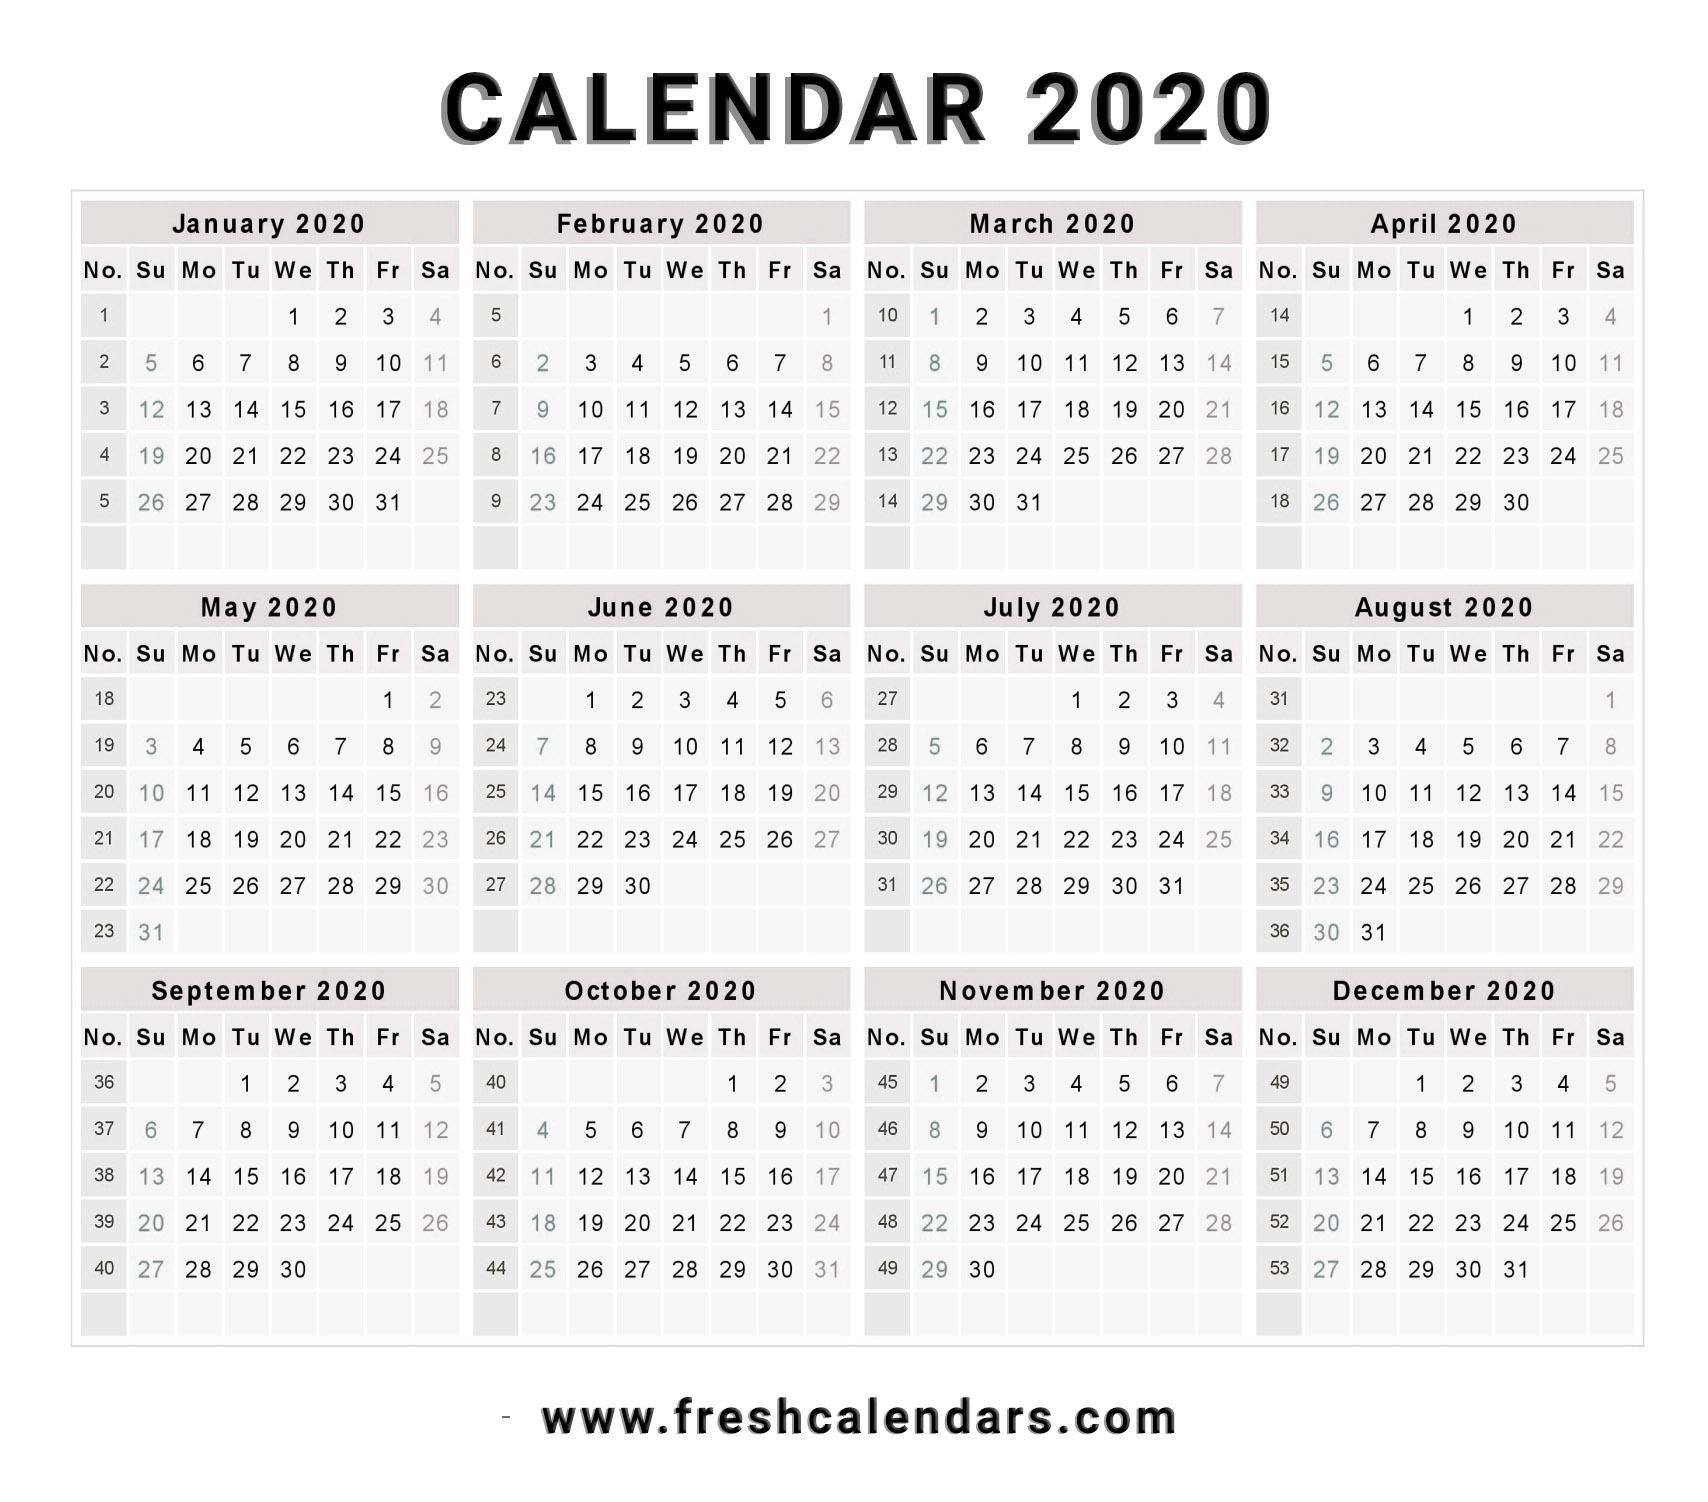 2020 Calendar regarding 2020 Calendar Printable Free With Added Oicture